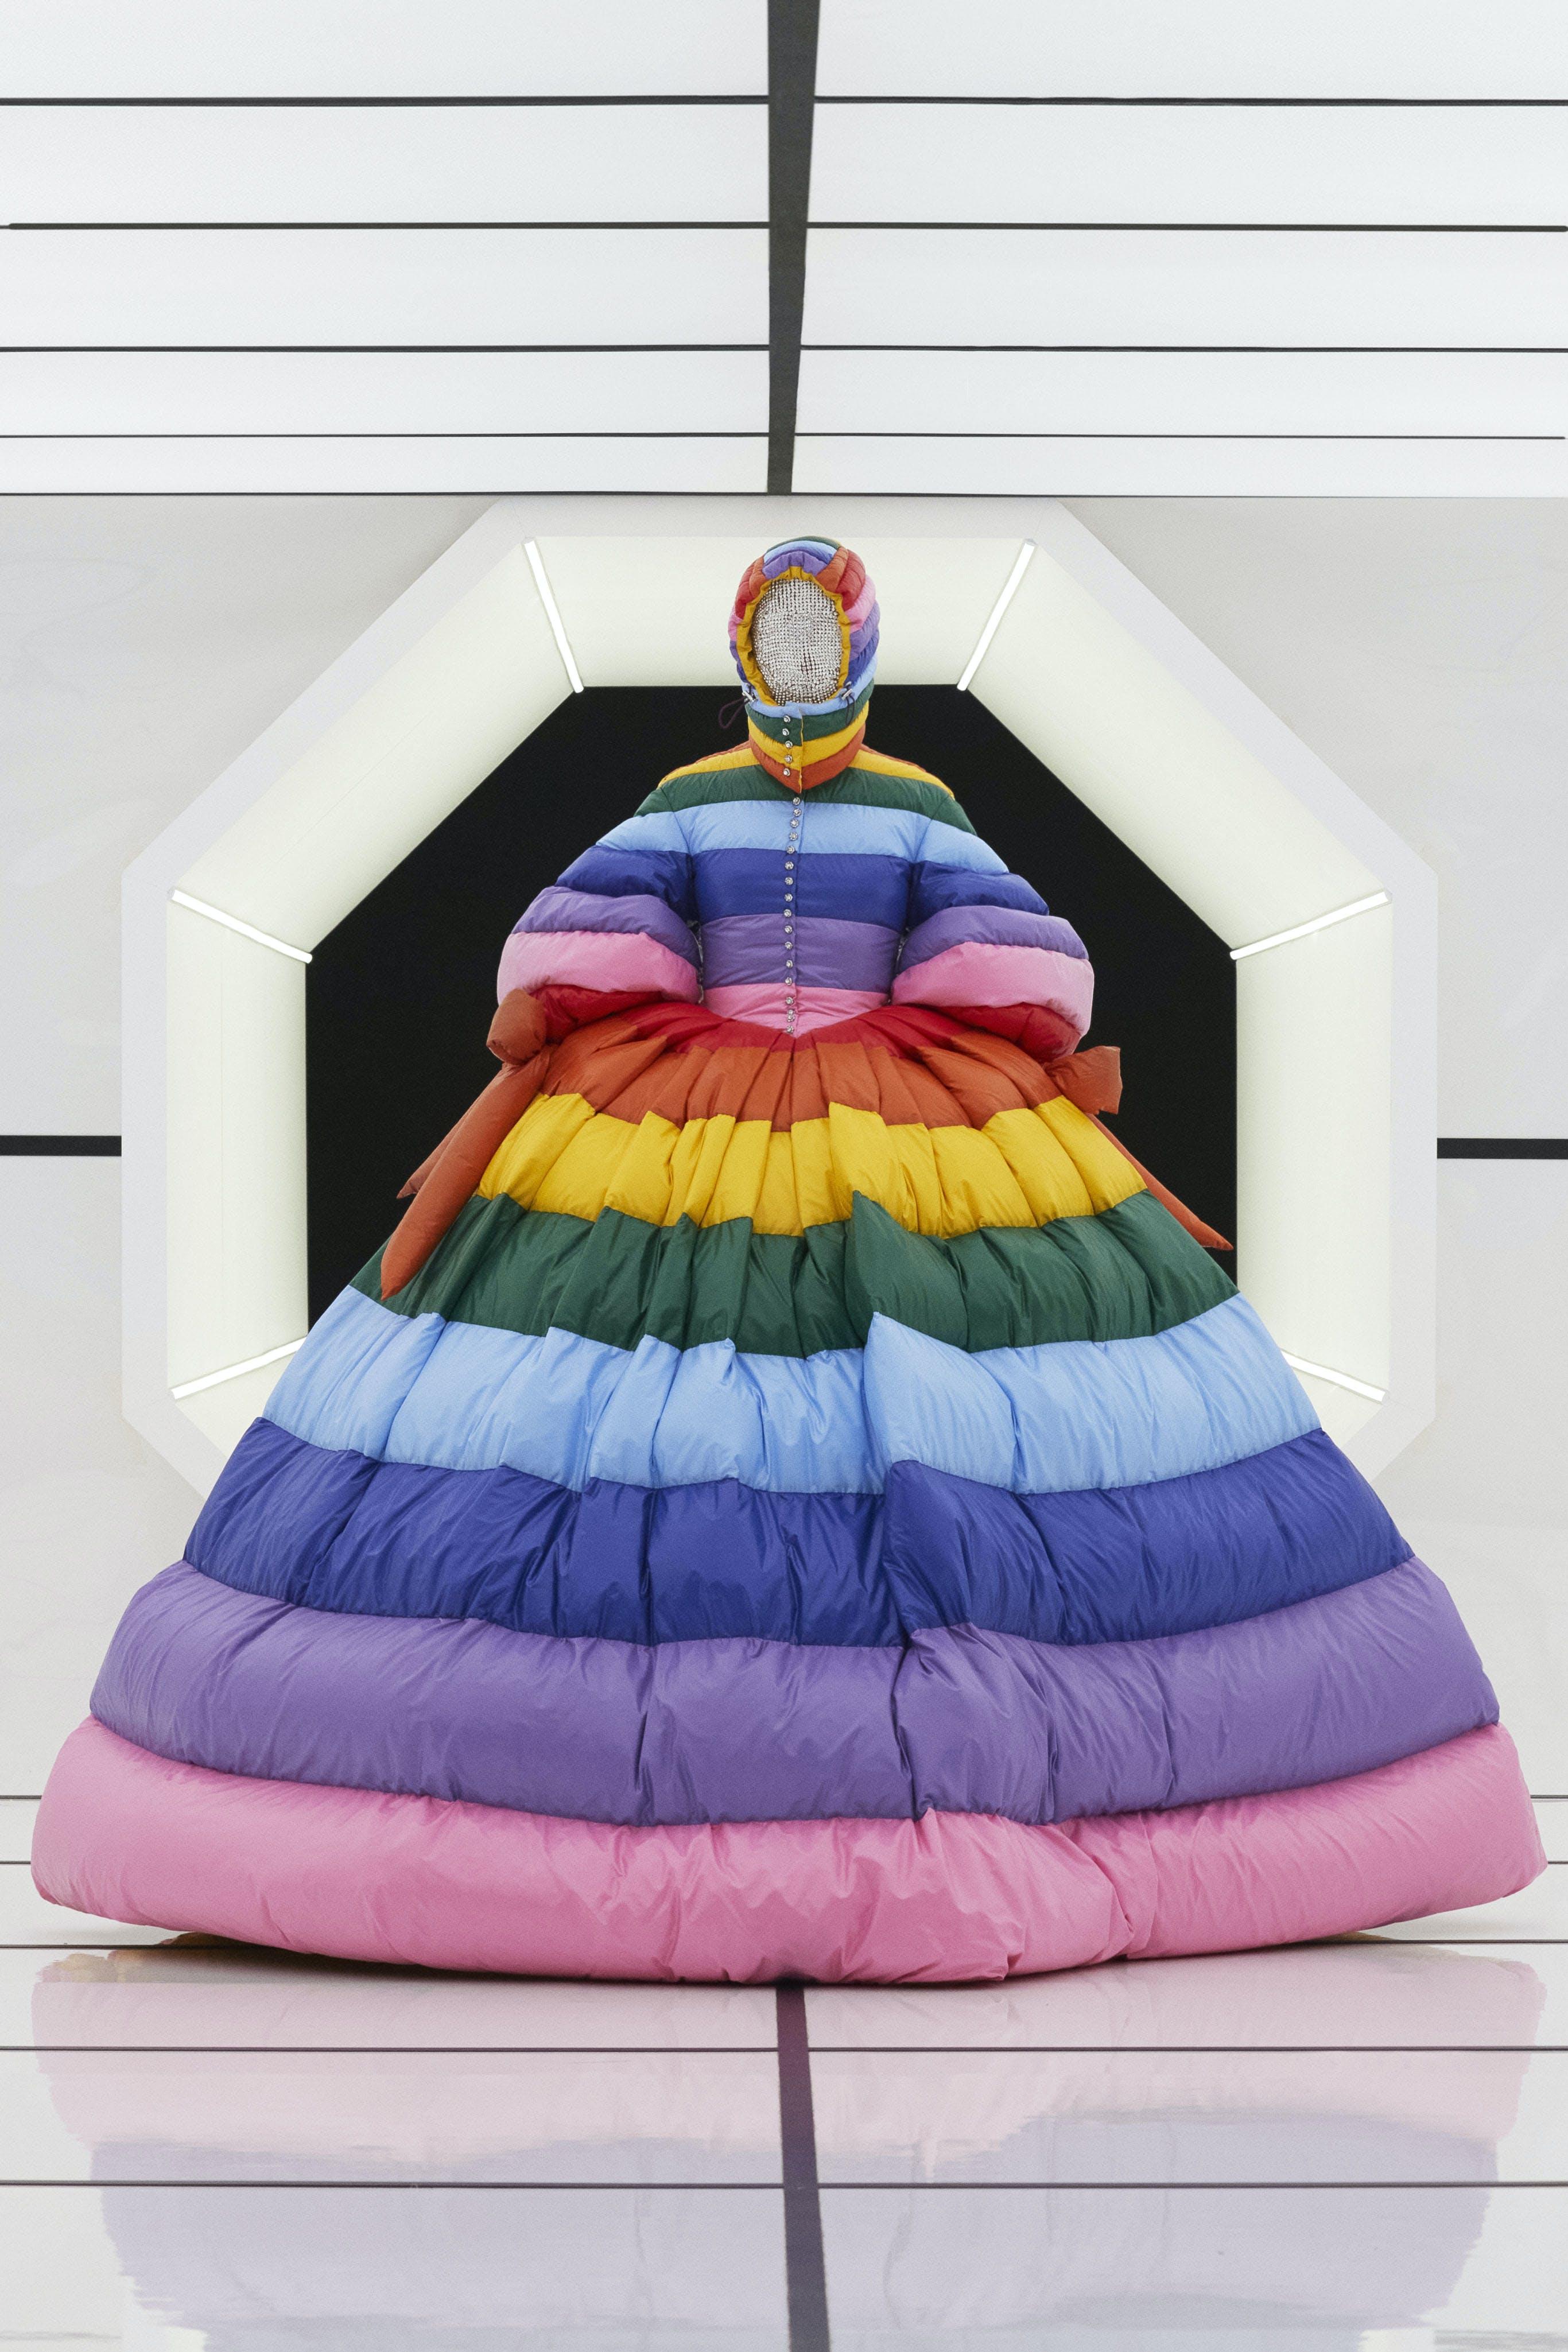 Moncler Genius milano fashion week collezione